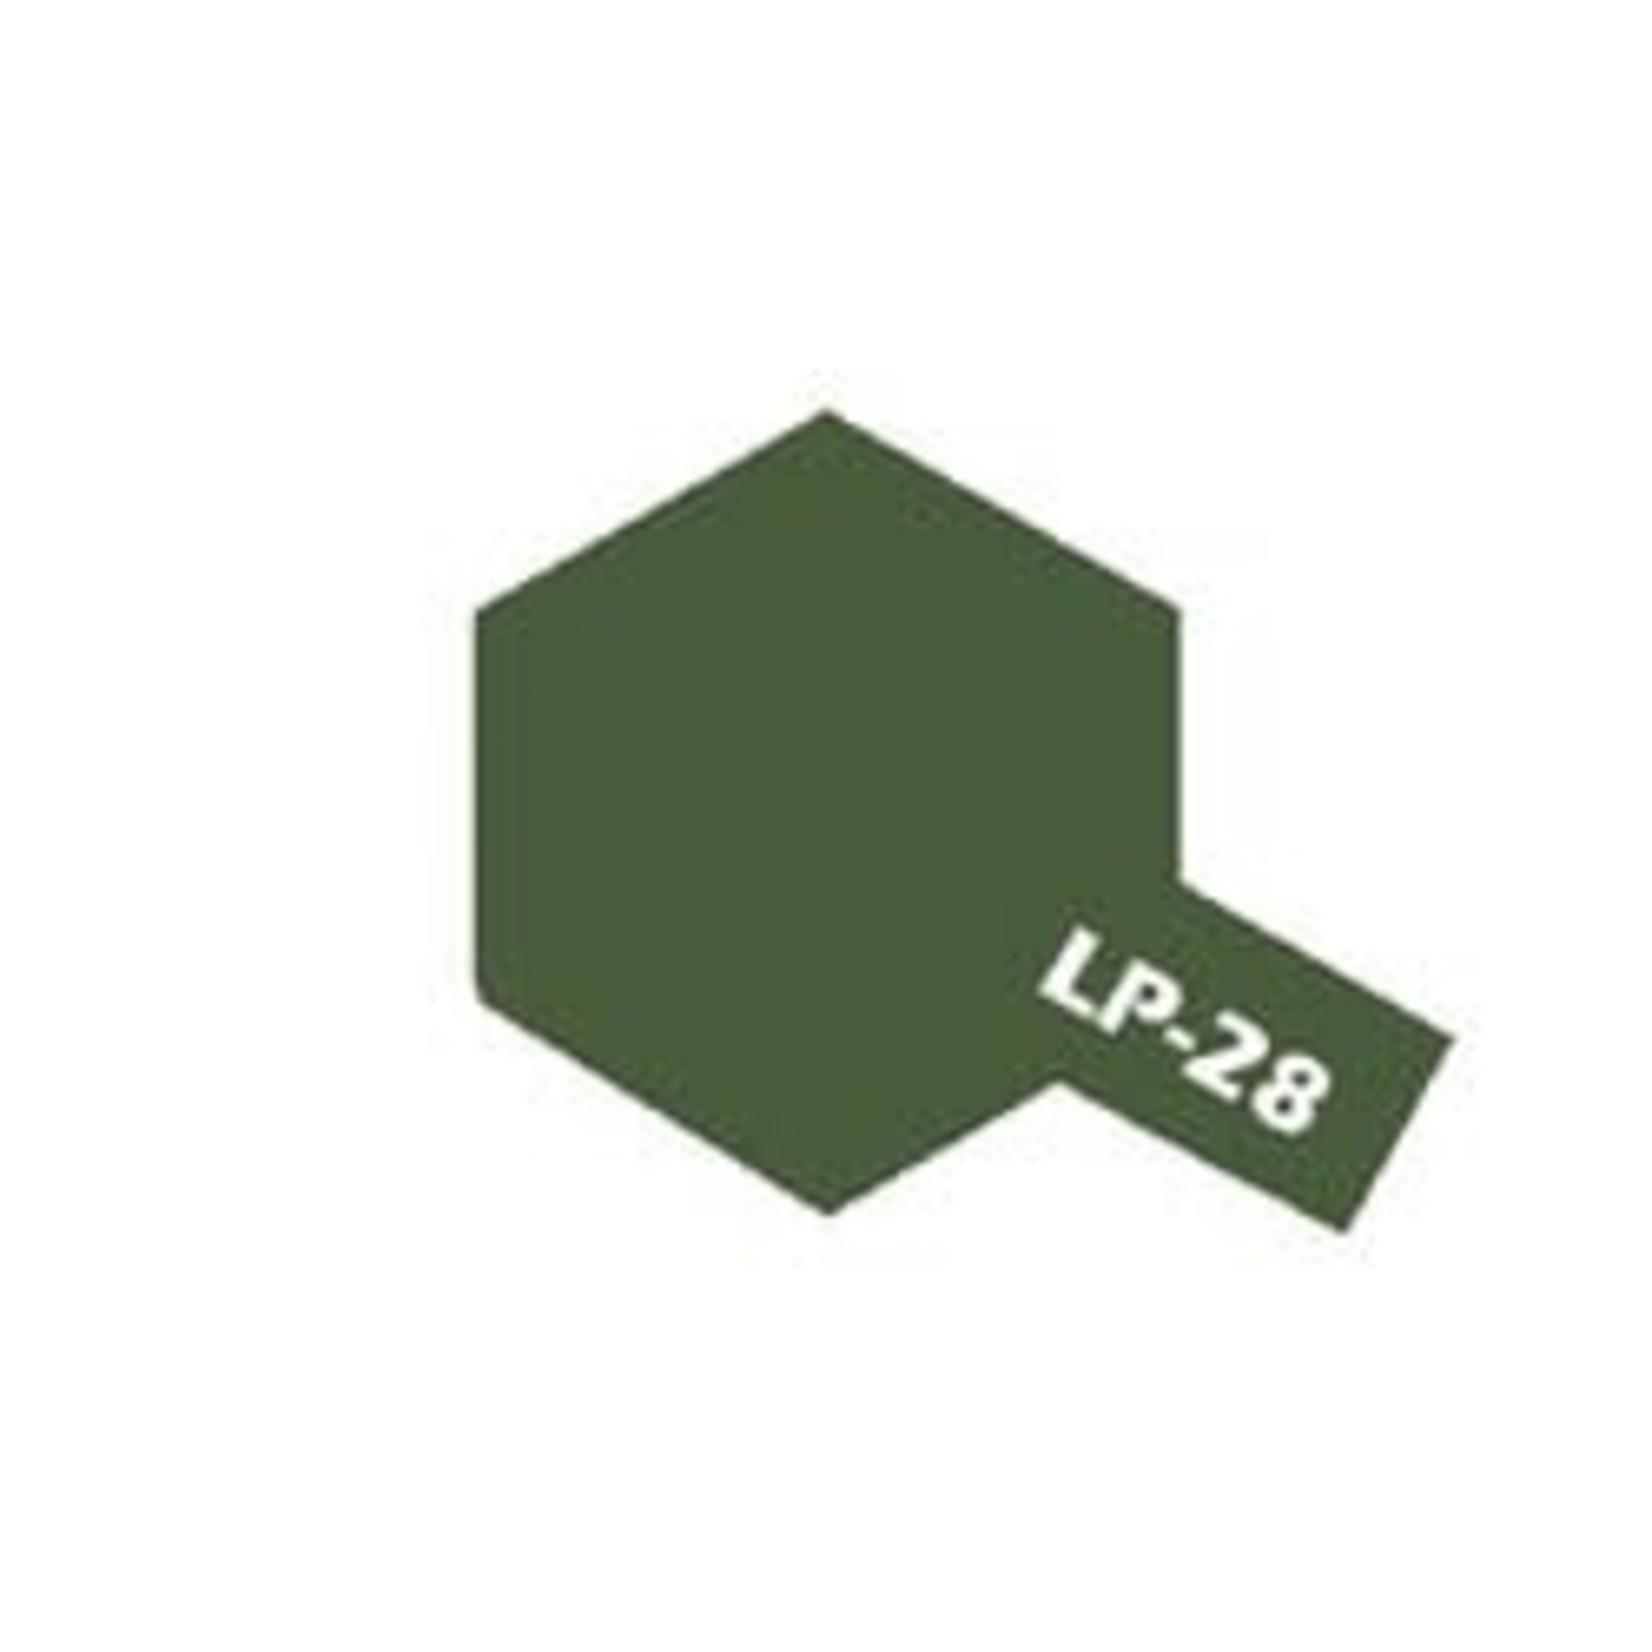 Tamiya TAMLP28 Lacquer Olive Drab (10ml)